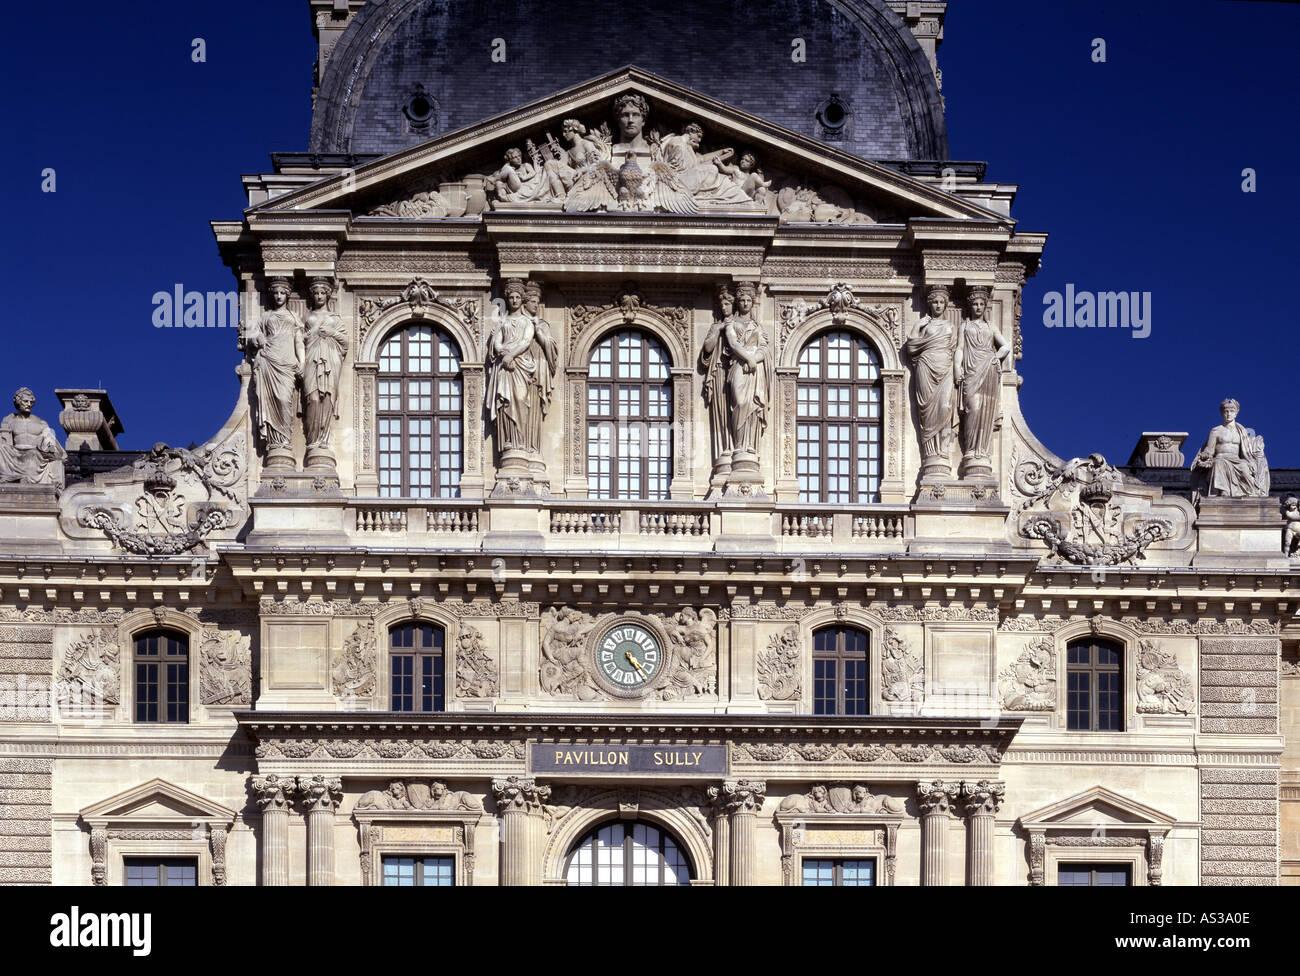 Paris, Louvre, Pavillon-de-l'Horloge, Karyatiden am Pavillon, 1636 - Stock Image